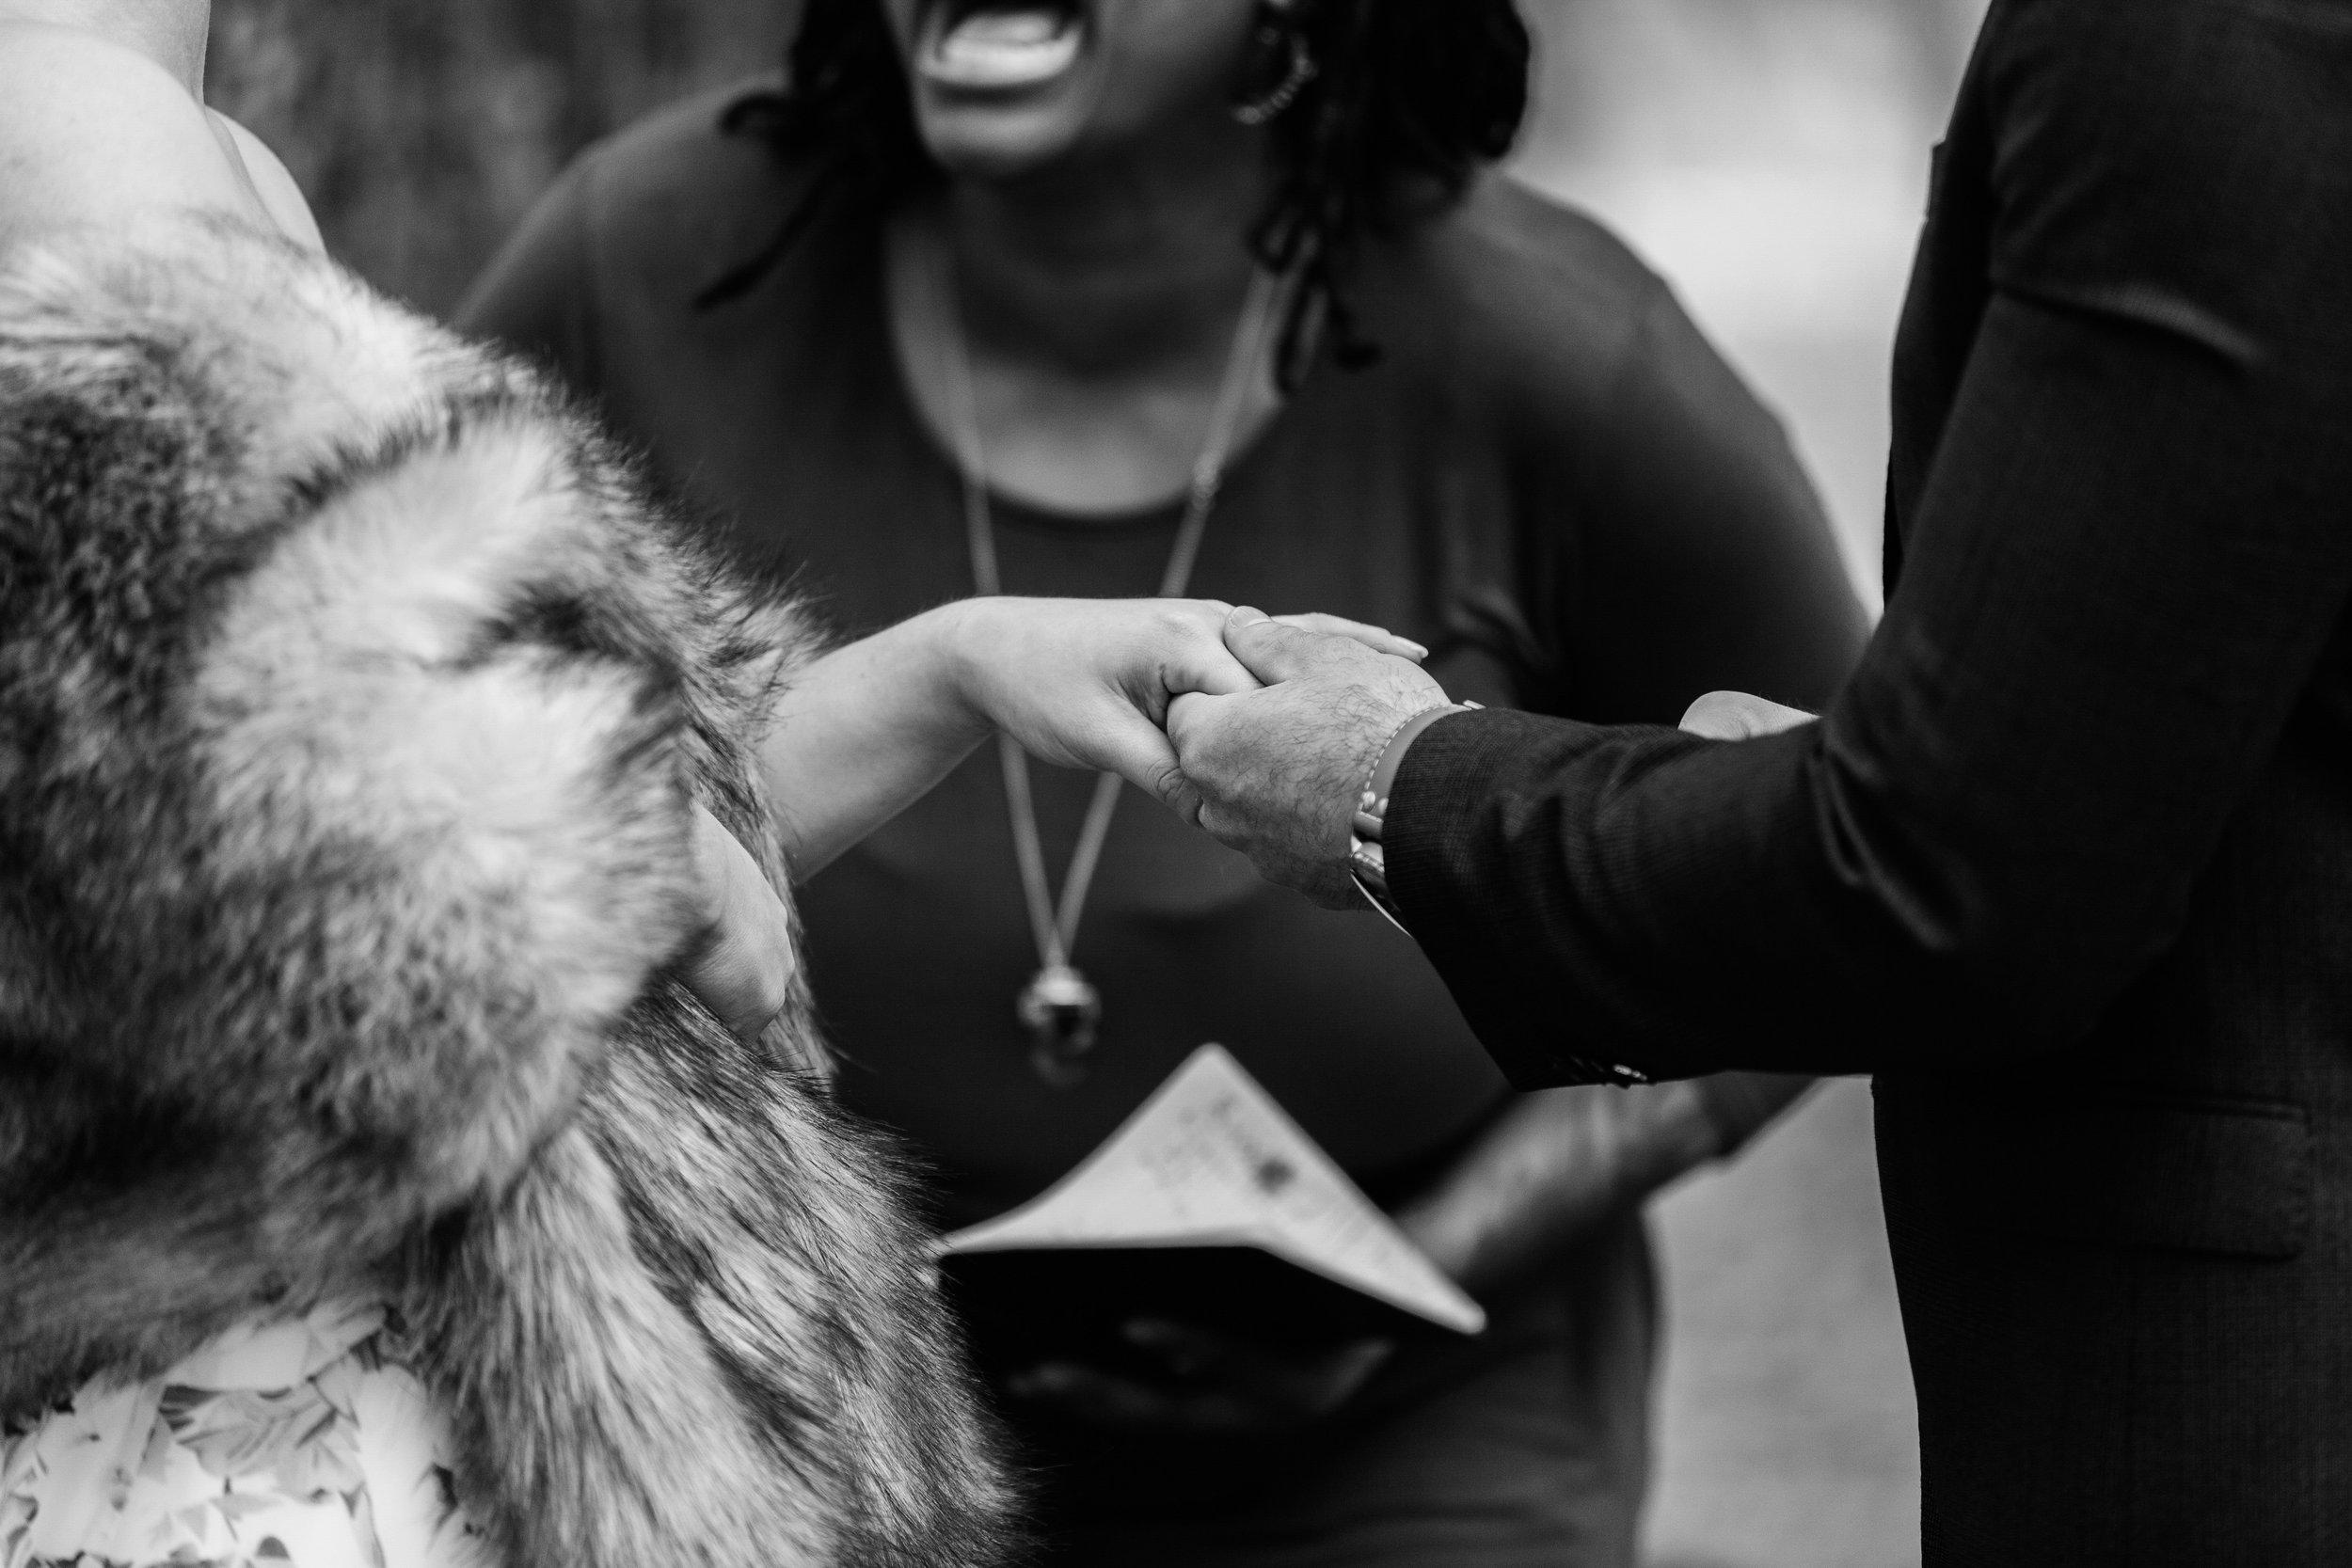 City Park Elopement New Orleans Wedding Photographer Ashley Biltz Photography6.jpg